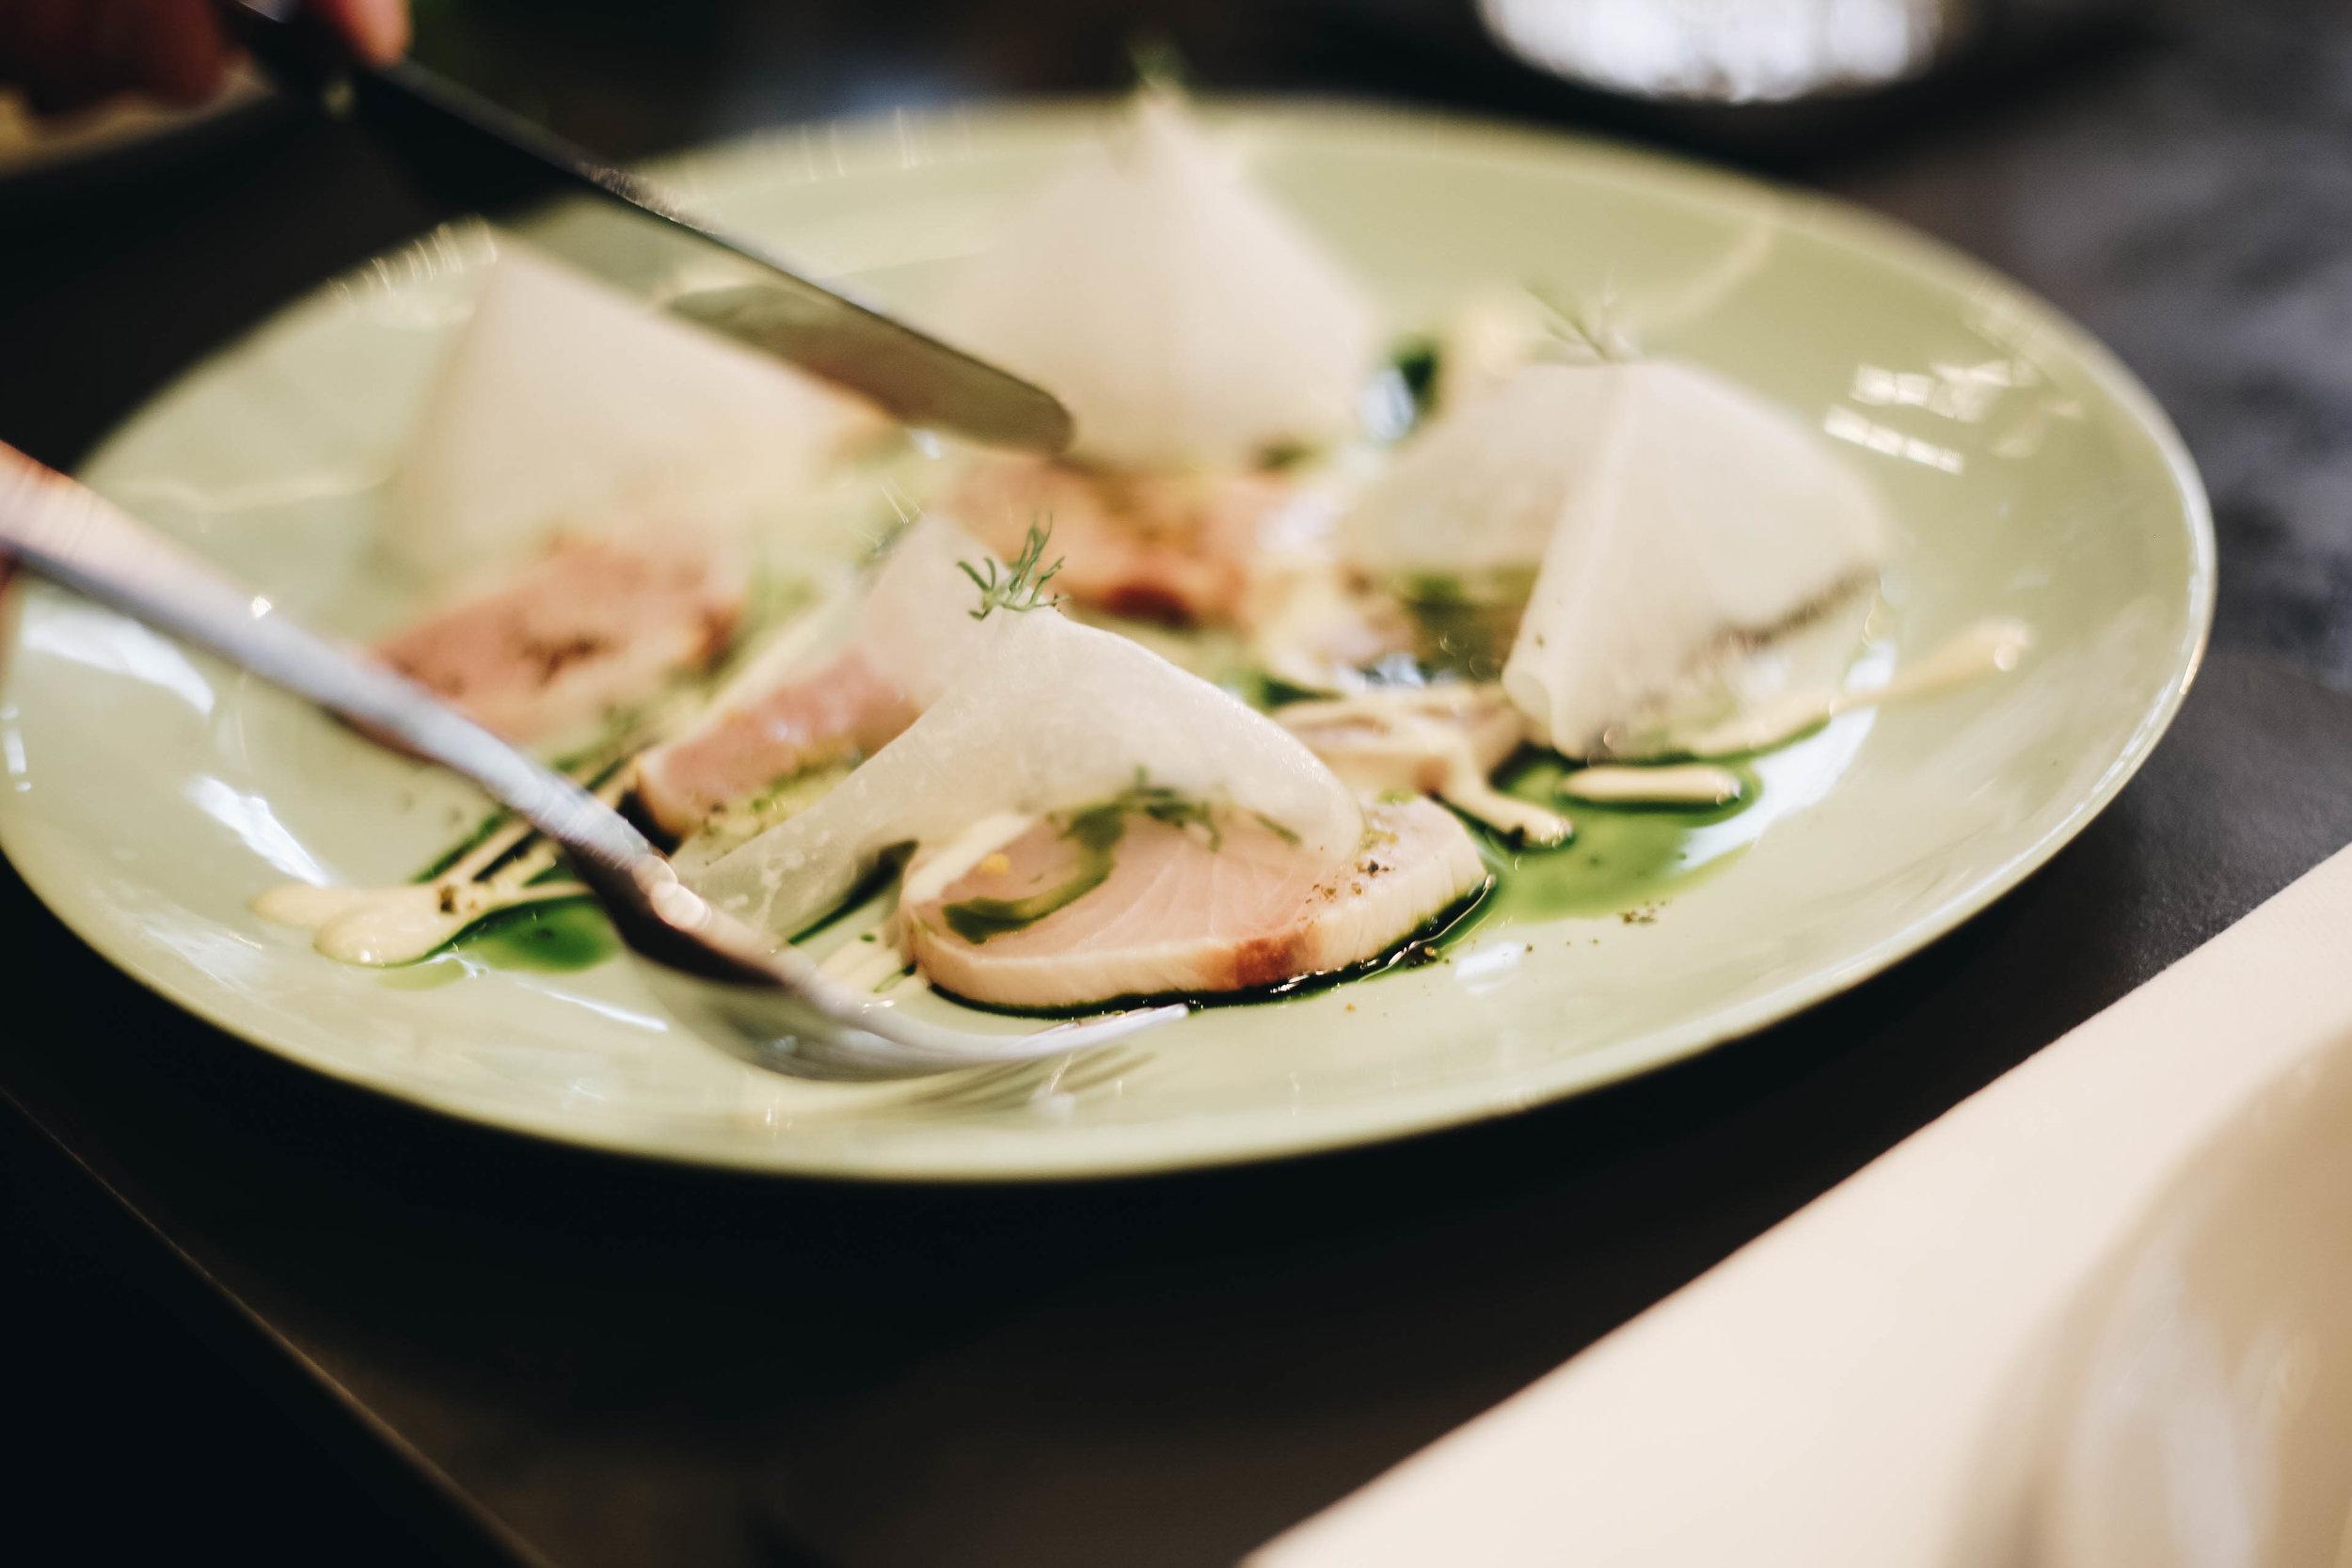 Tataki kingfish with dill and vermouth dressing